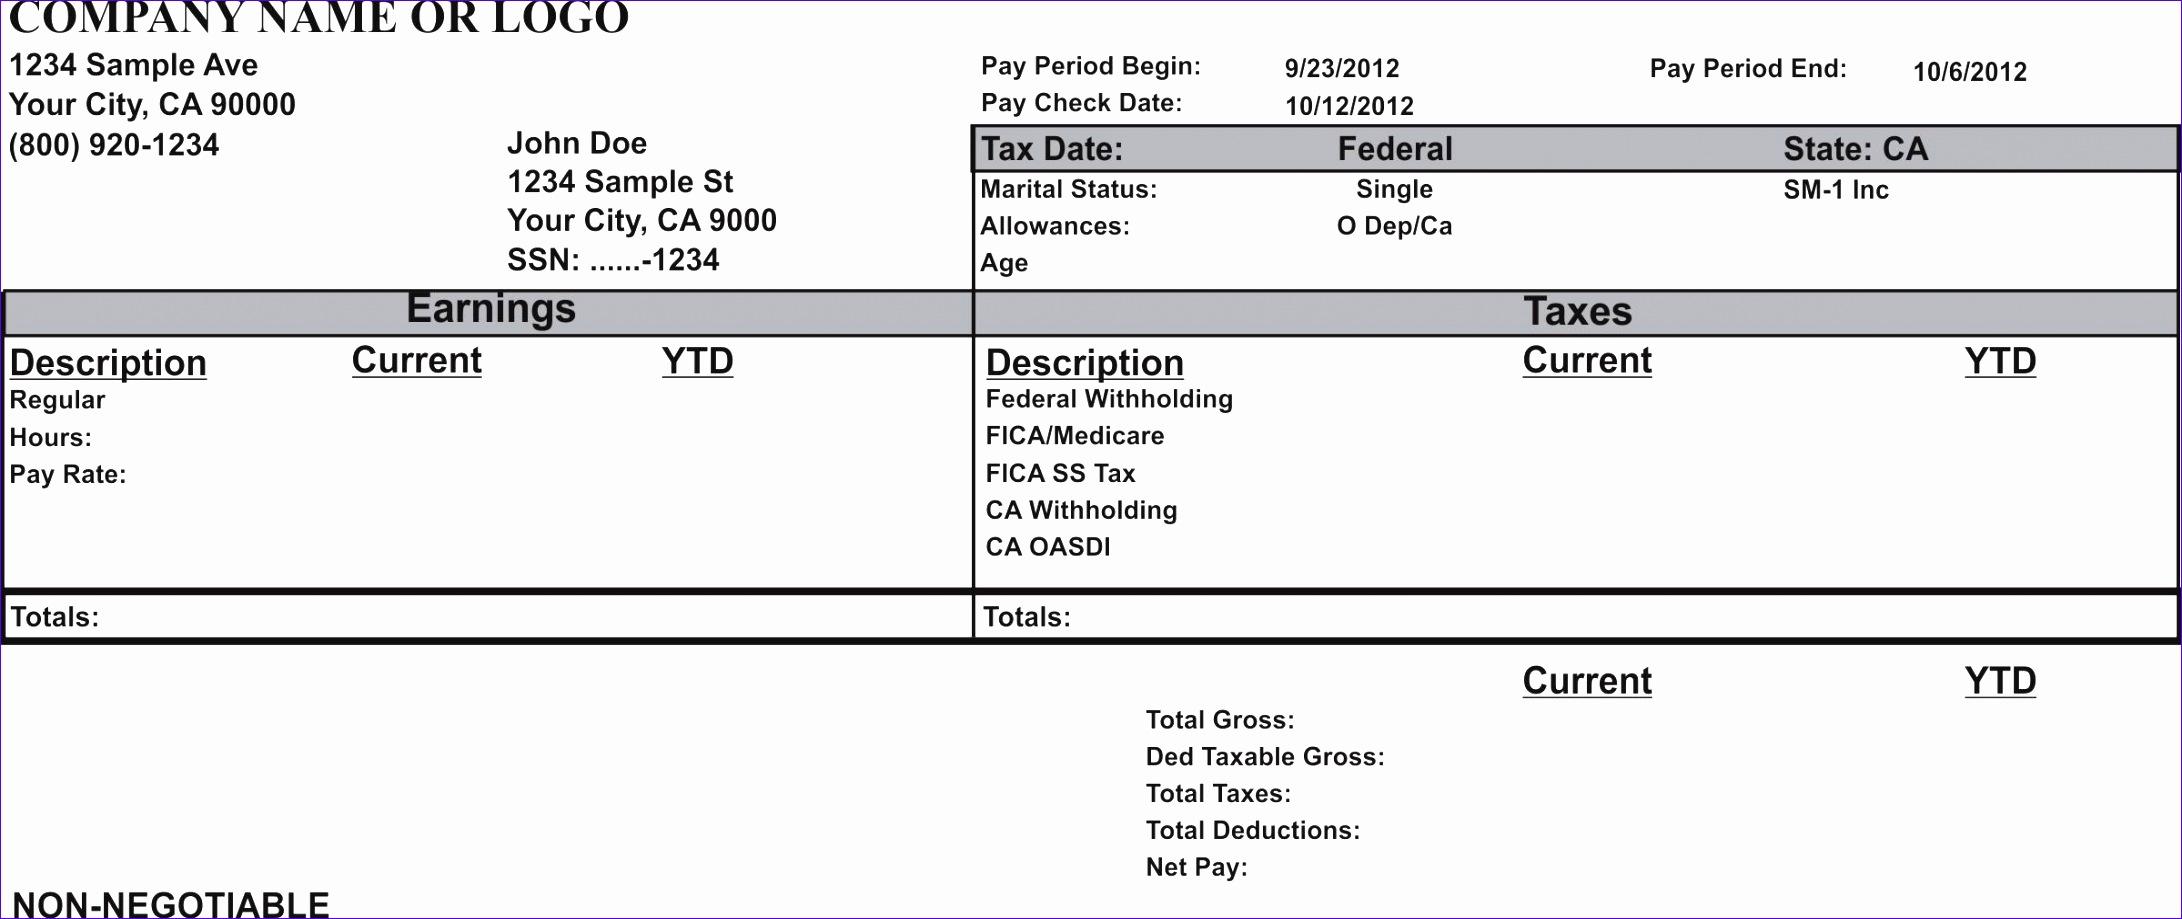 paycheck stub sample free 2182919